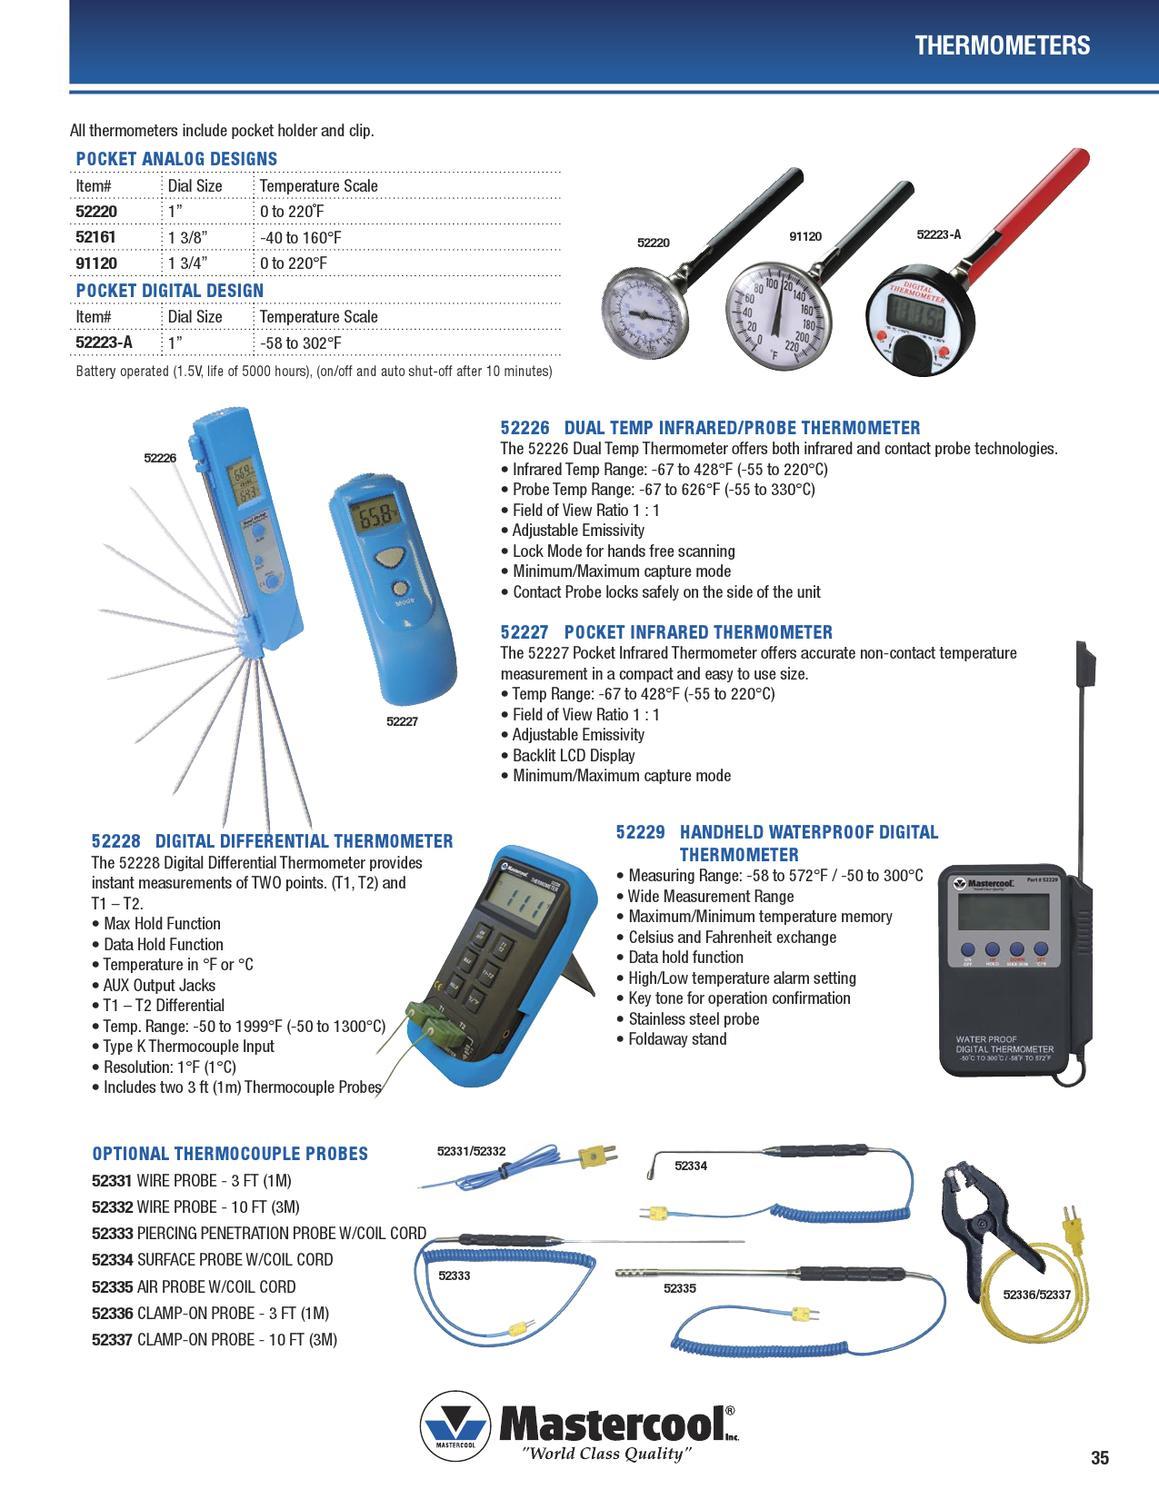 Mastercool 52220 Pocket Analog Thermometer